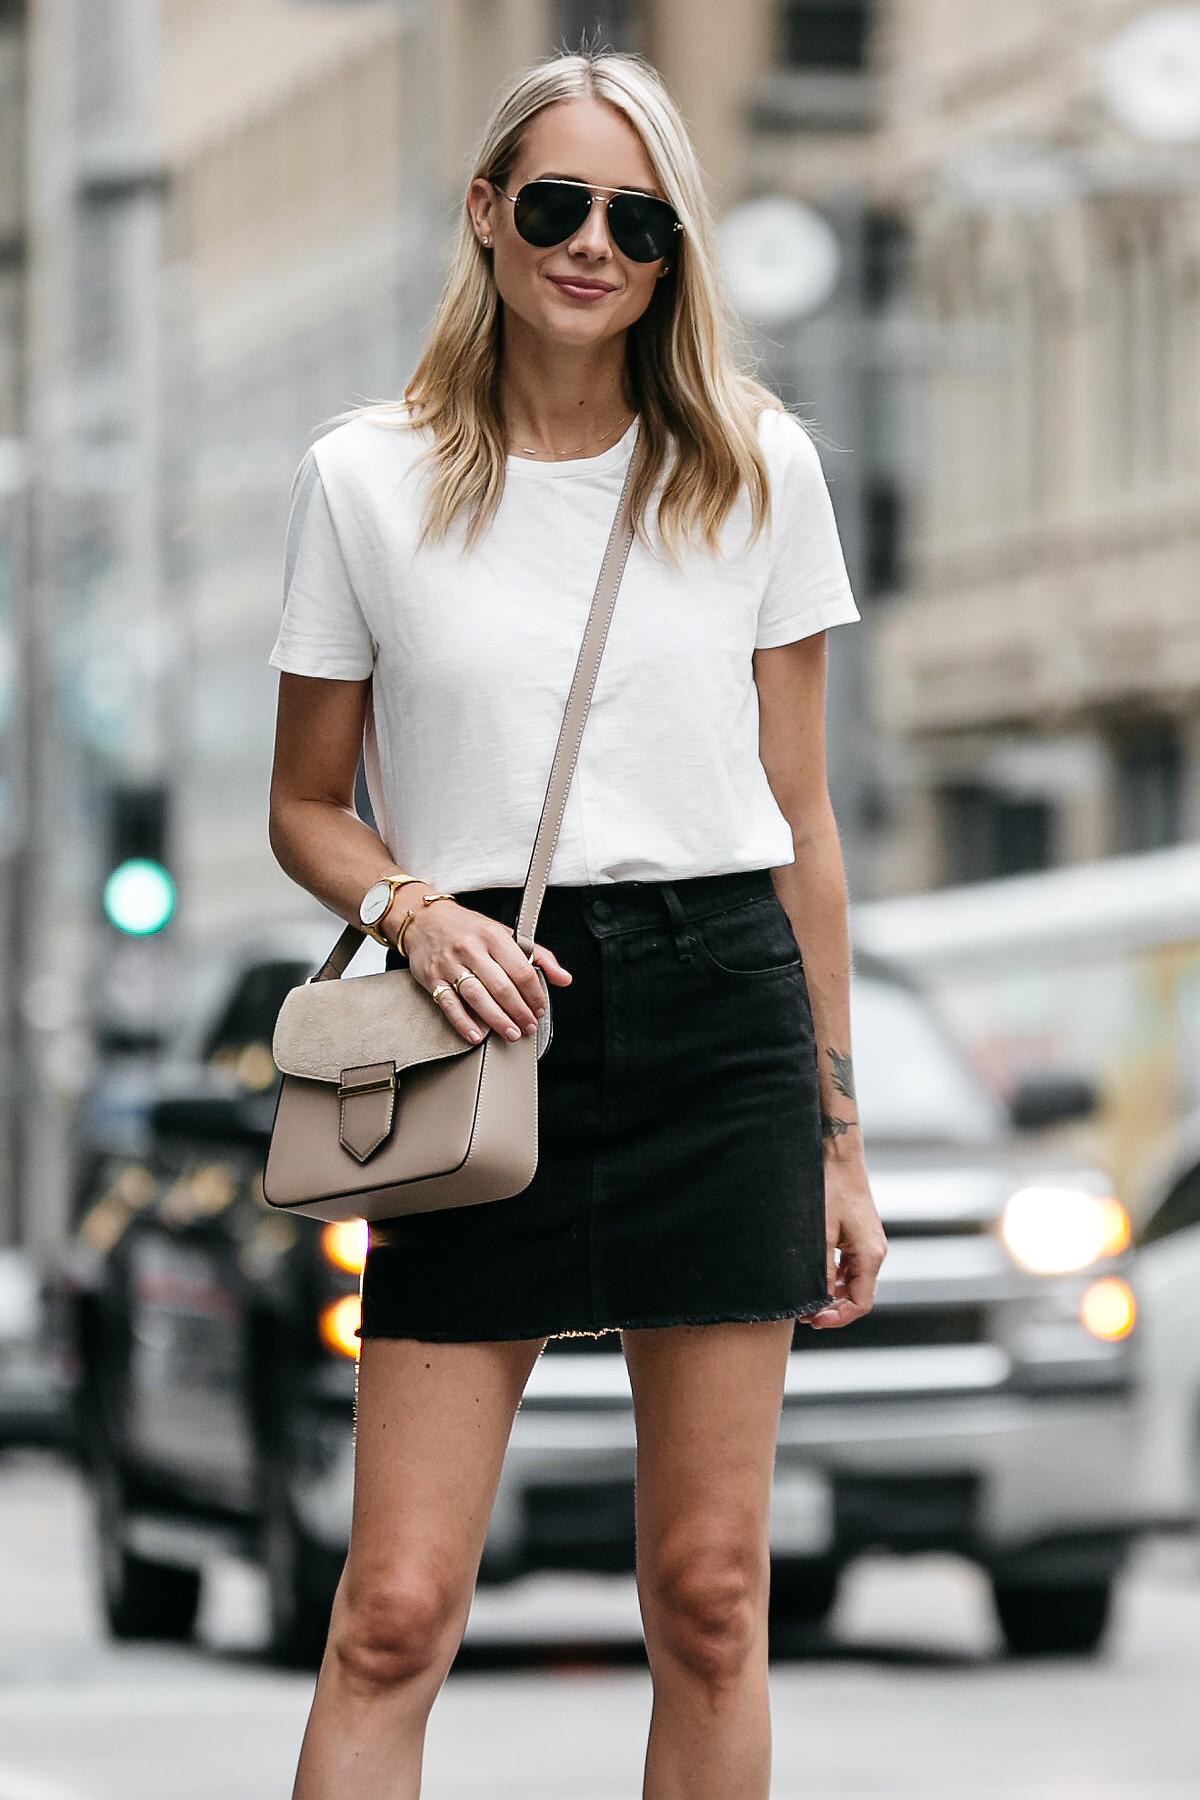 Blonde woman wearing white tshirt frame black denim skirt outfit tan crossbody handbag street style dallas blogger fashion blogger